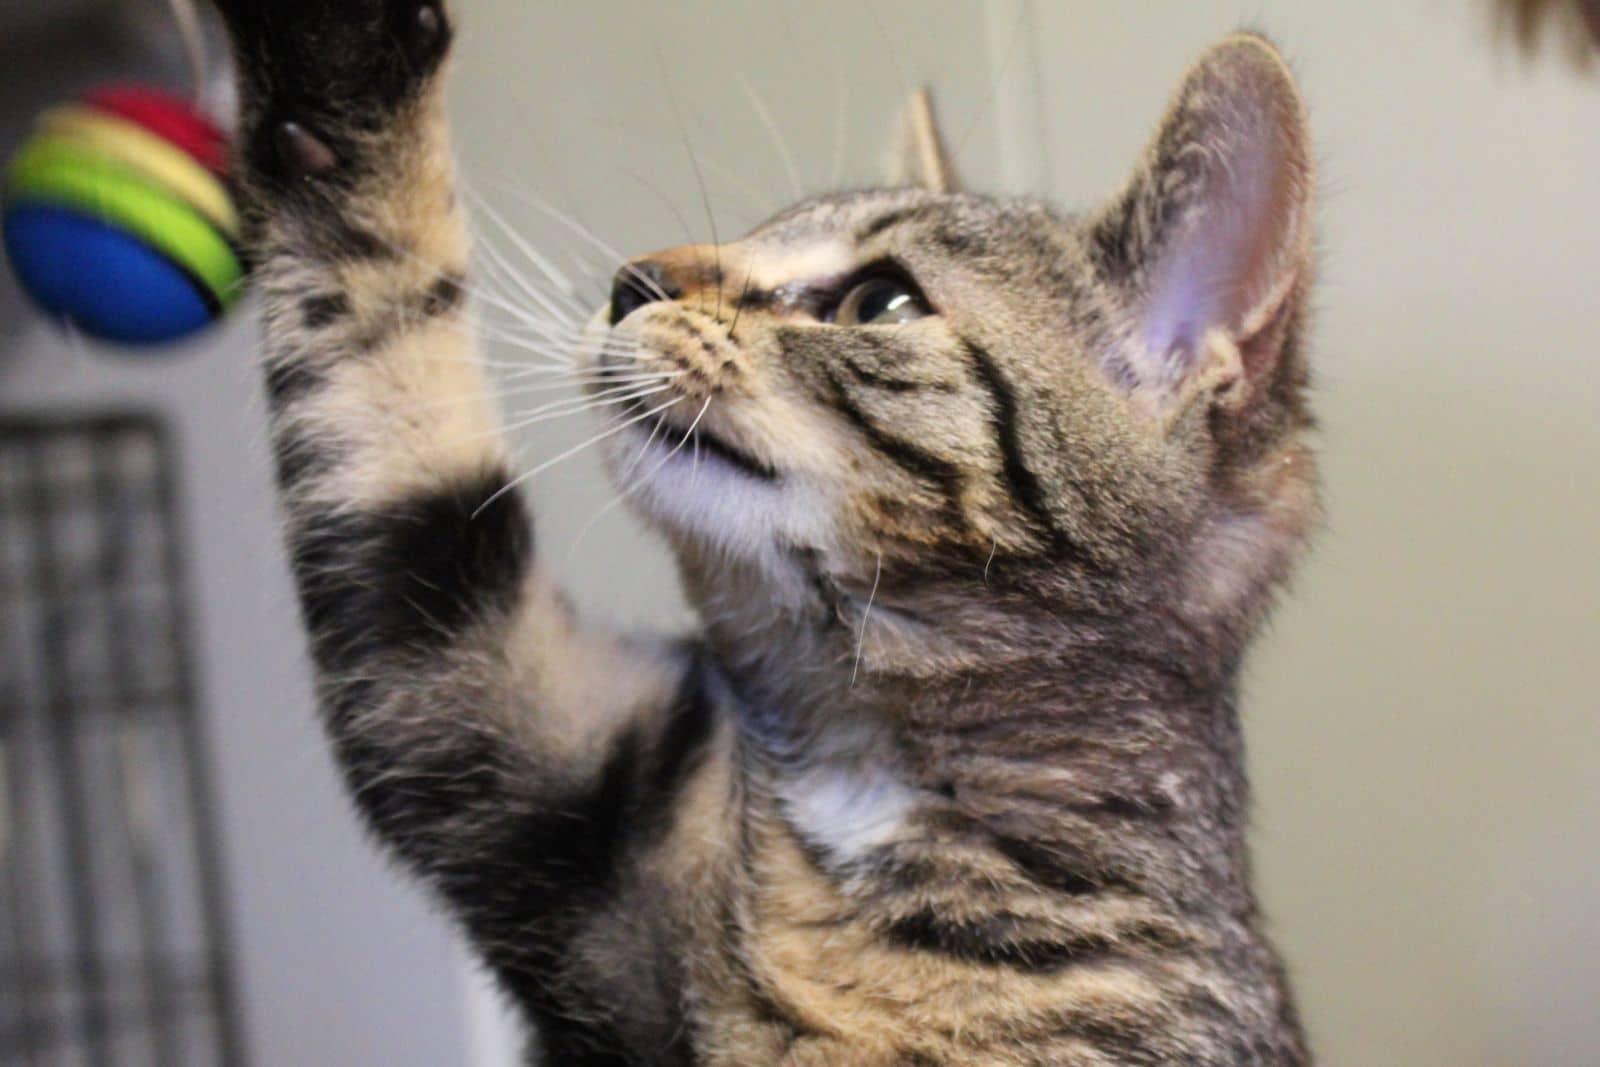 Zatrudnimy opiekuna/opiekunkę kotów